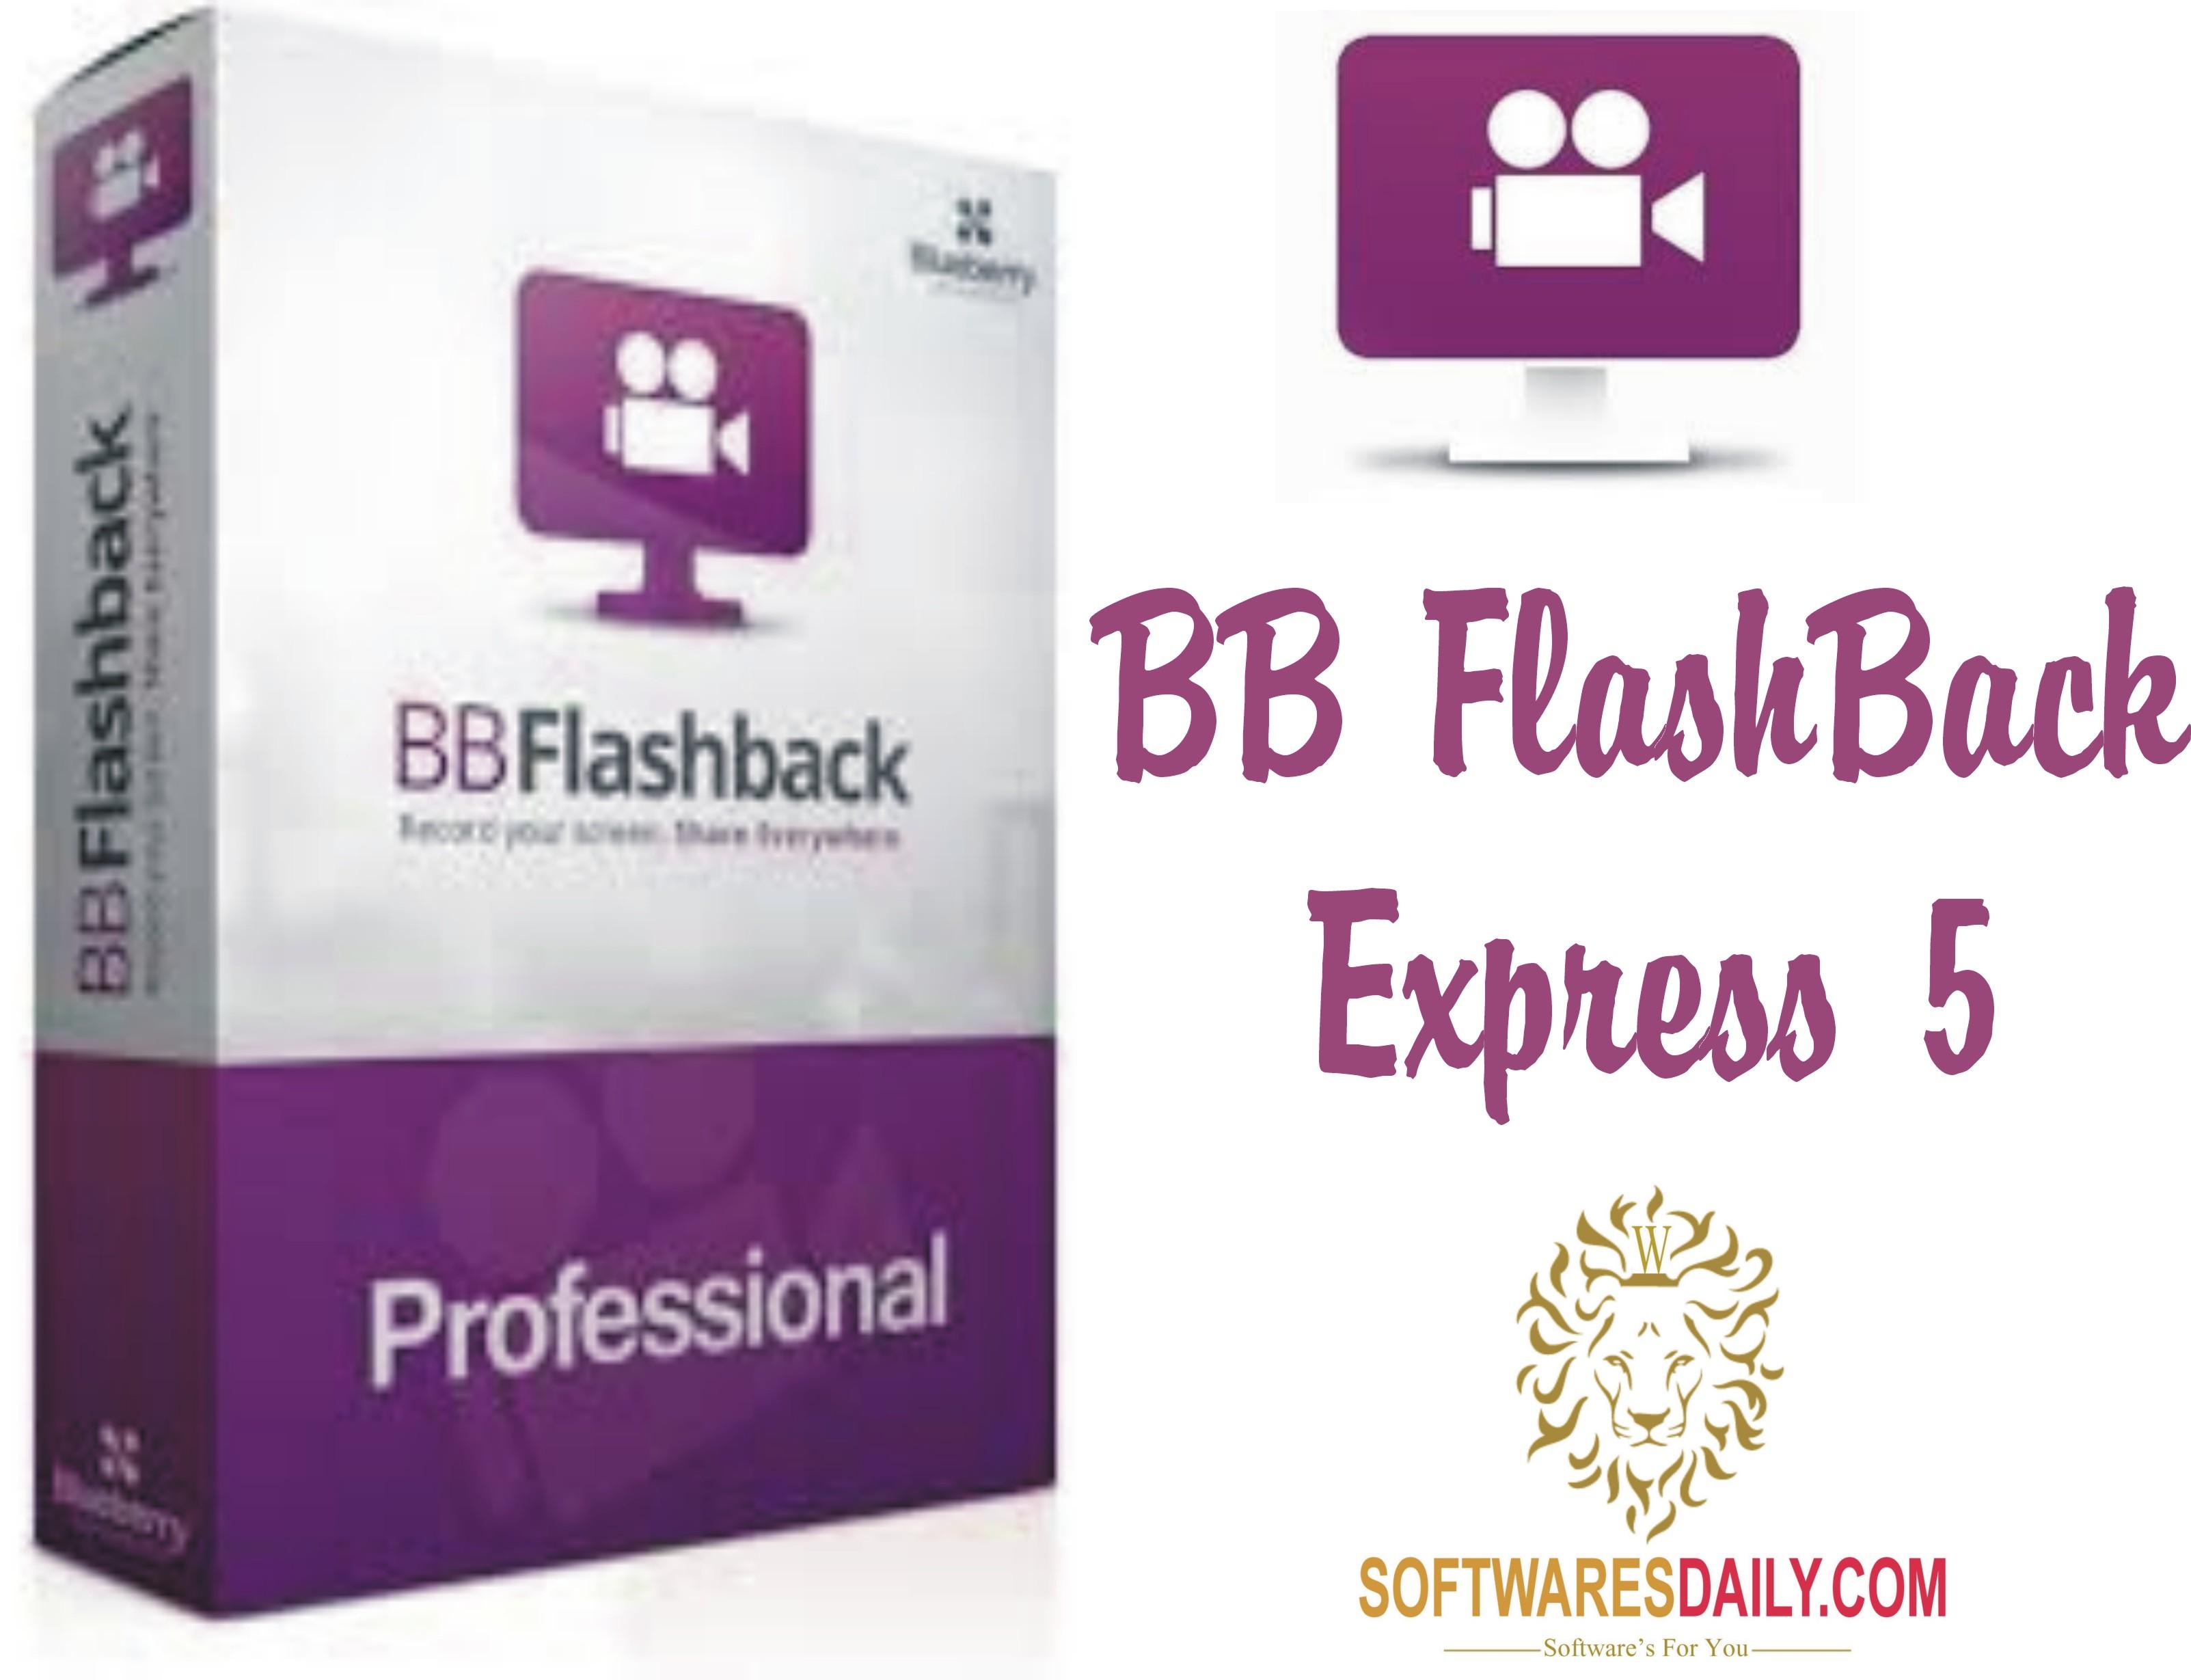 bb flashback free player